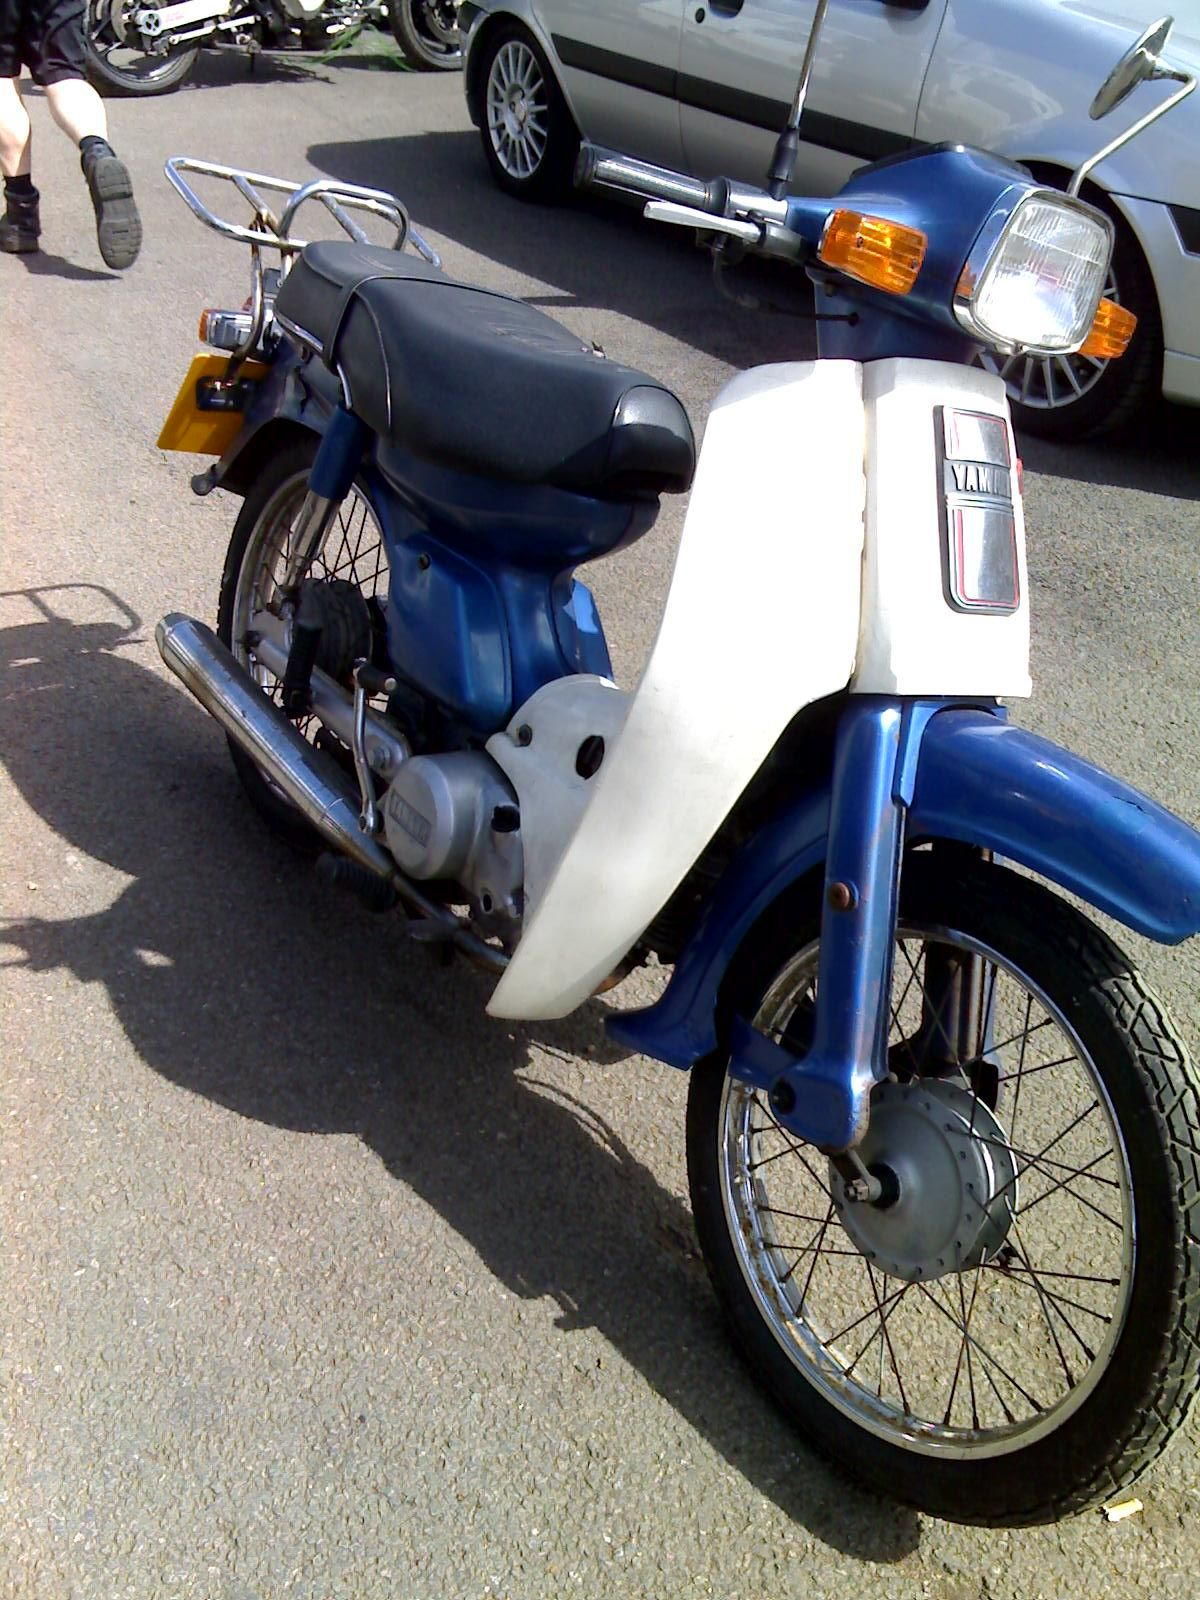 1985 Yamaha T80 Townmate Classic Motorcycles Yamaha